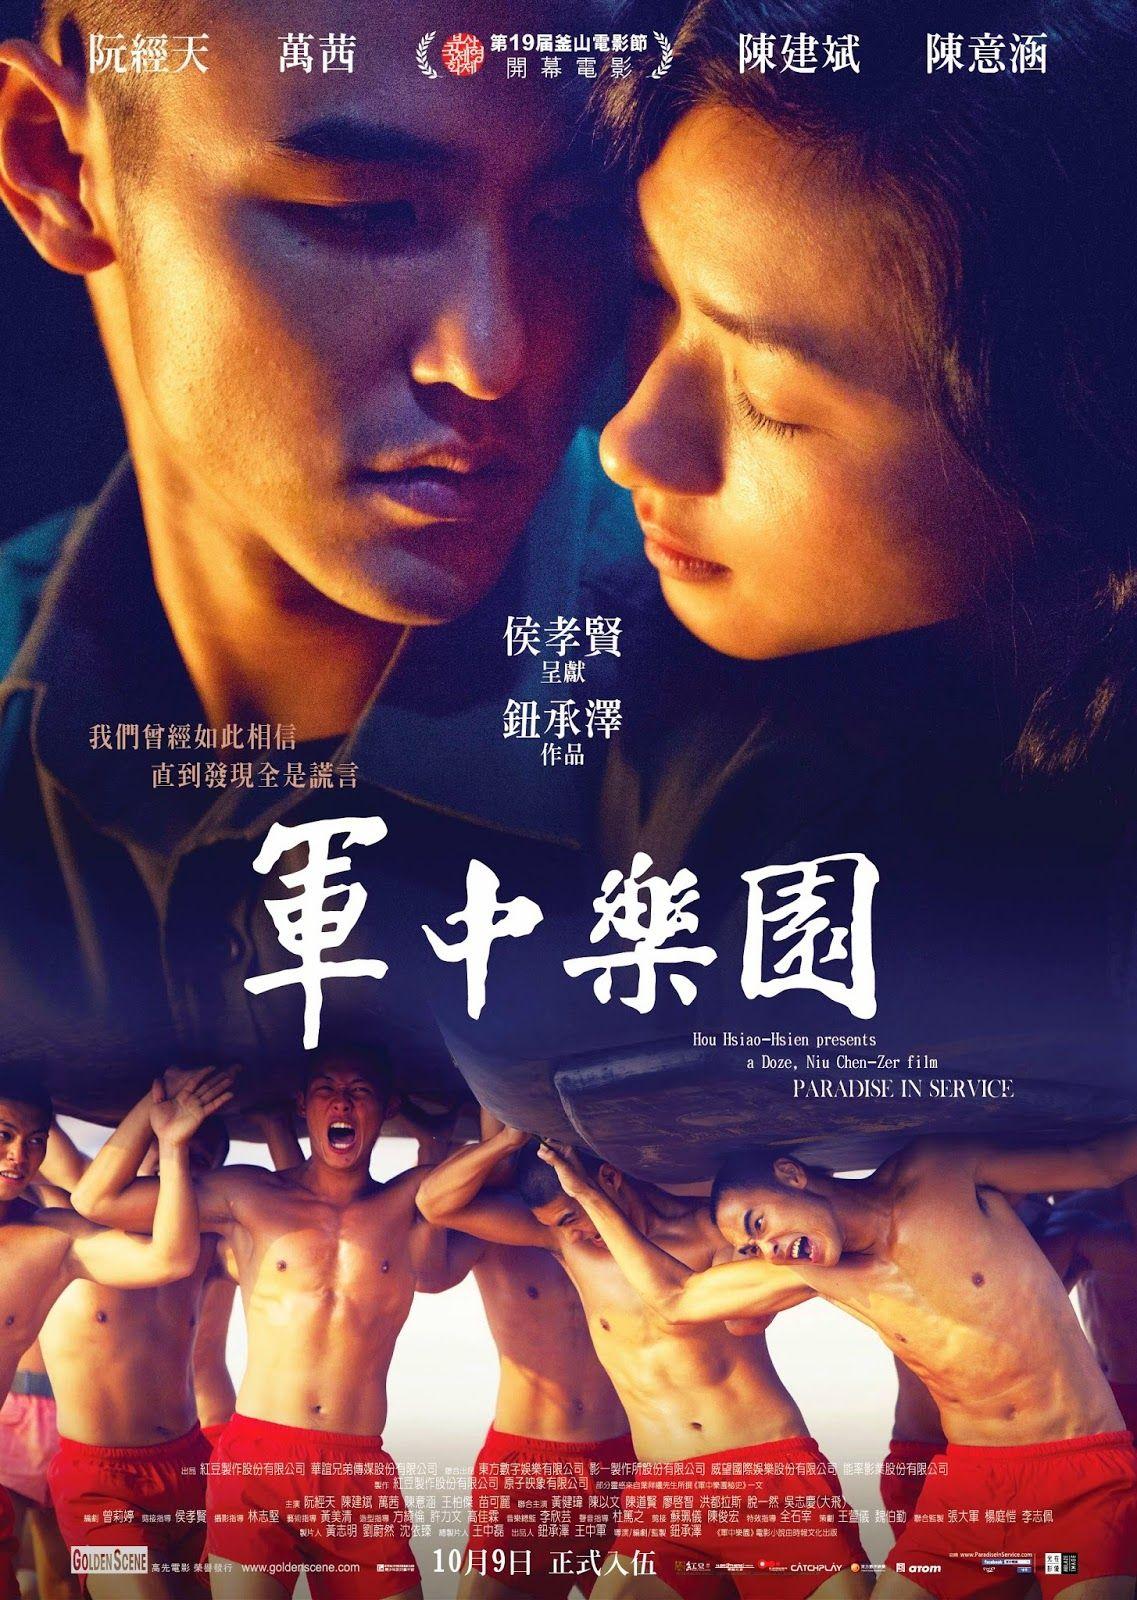 Film Pinterest Ma Shang Xuan Hu X1 Mouse Professional Gaming